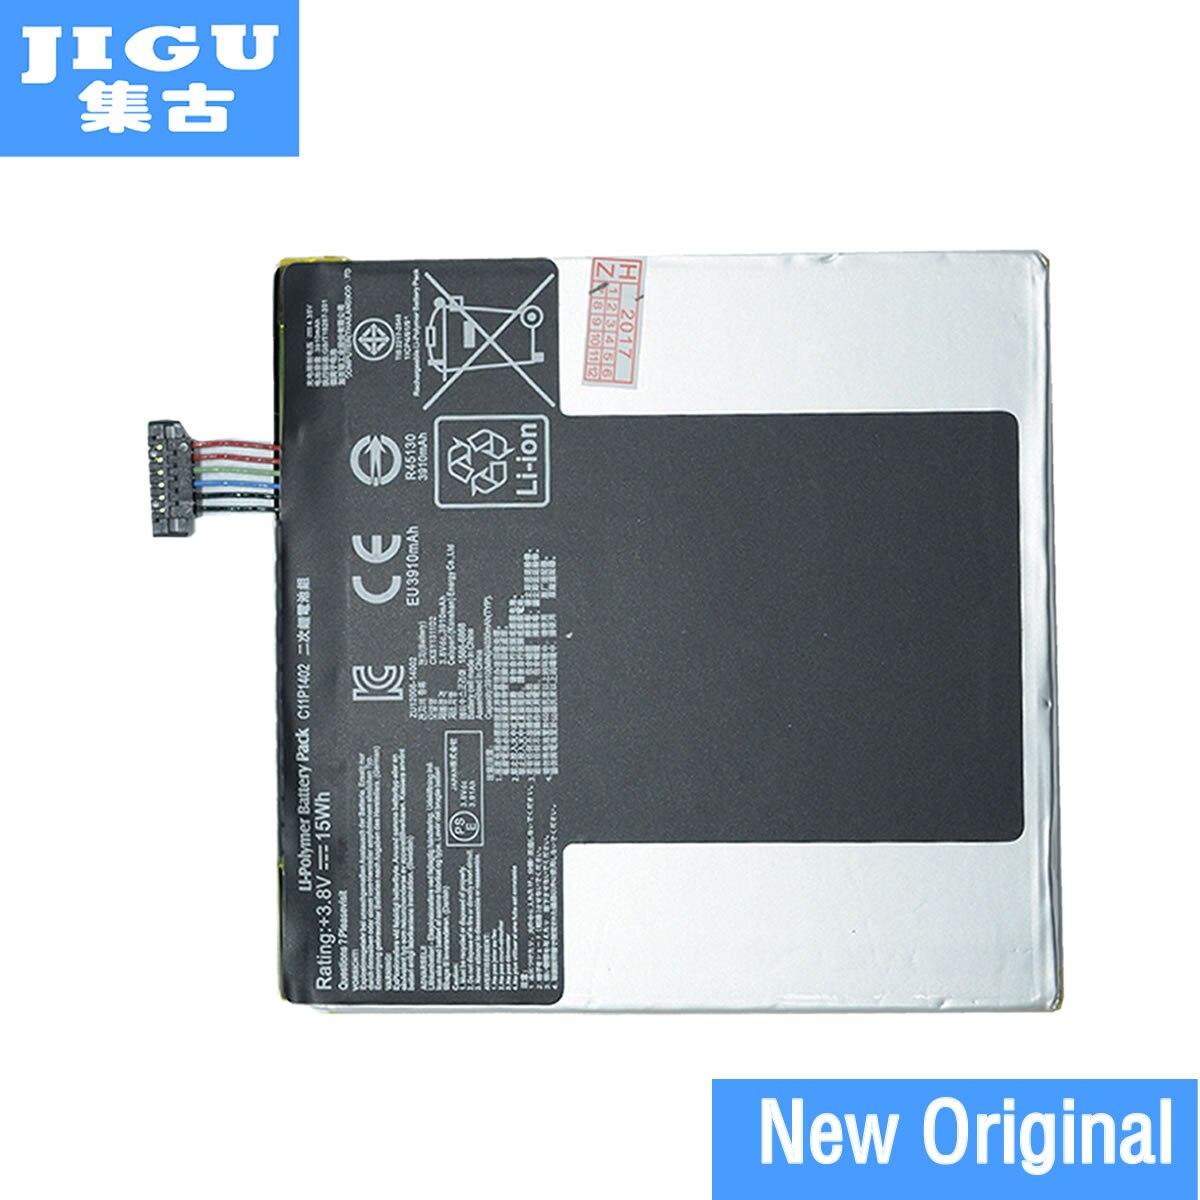 JIGU Original Battery C11P1402 For ASUS For Fonepad 7 FE375CG K019 FE7530CXG For FonePad 7 FE375CXGJIGU Original Battery C11P1402 For ASUS For Fonepad 7 FE375CG K019 FE7530CXG For FonePad 7 FE375CXG